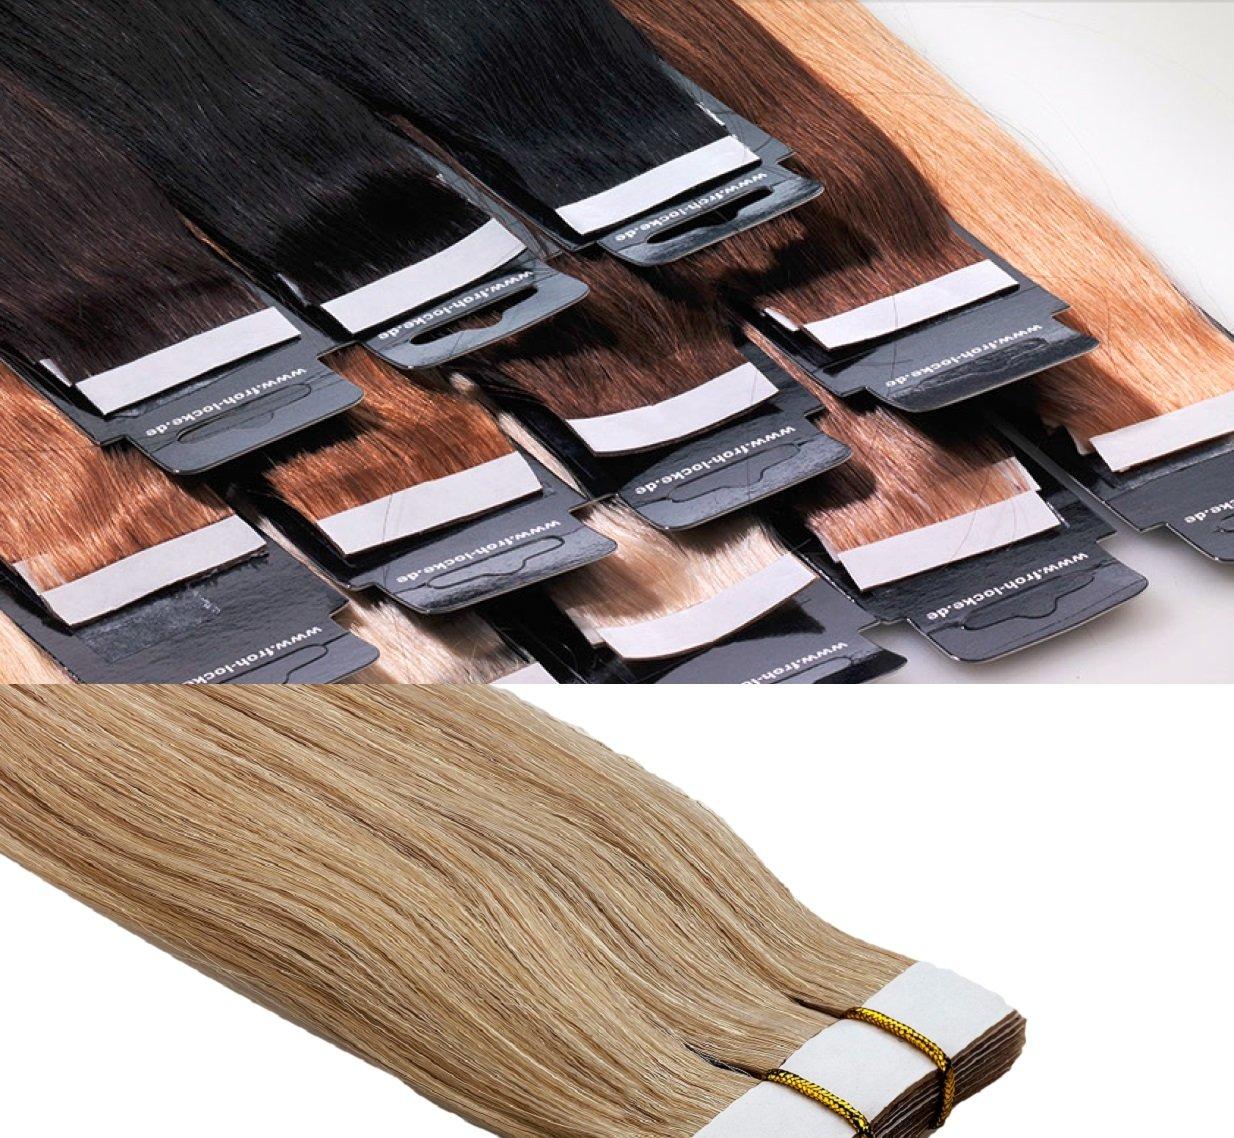 Tape In/On Echthaar Extensions Haarqualität: Virgin Remy - höchste Qualitätsstufe 60cm 10 Tressen Marke Frohlocke SALON PRO (24 - goldblond) SP